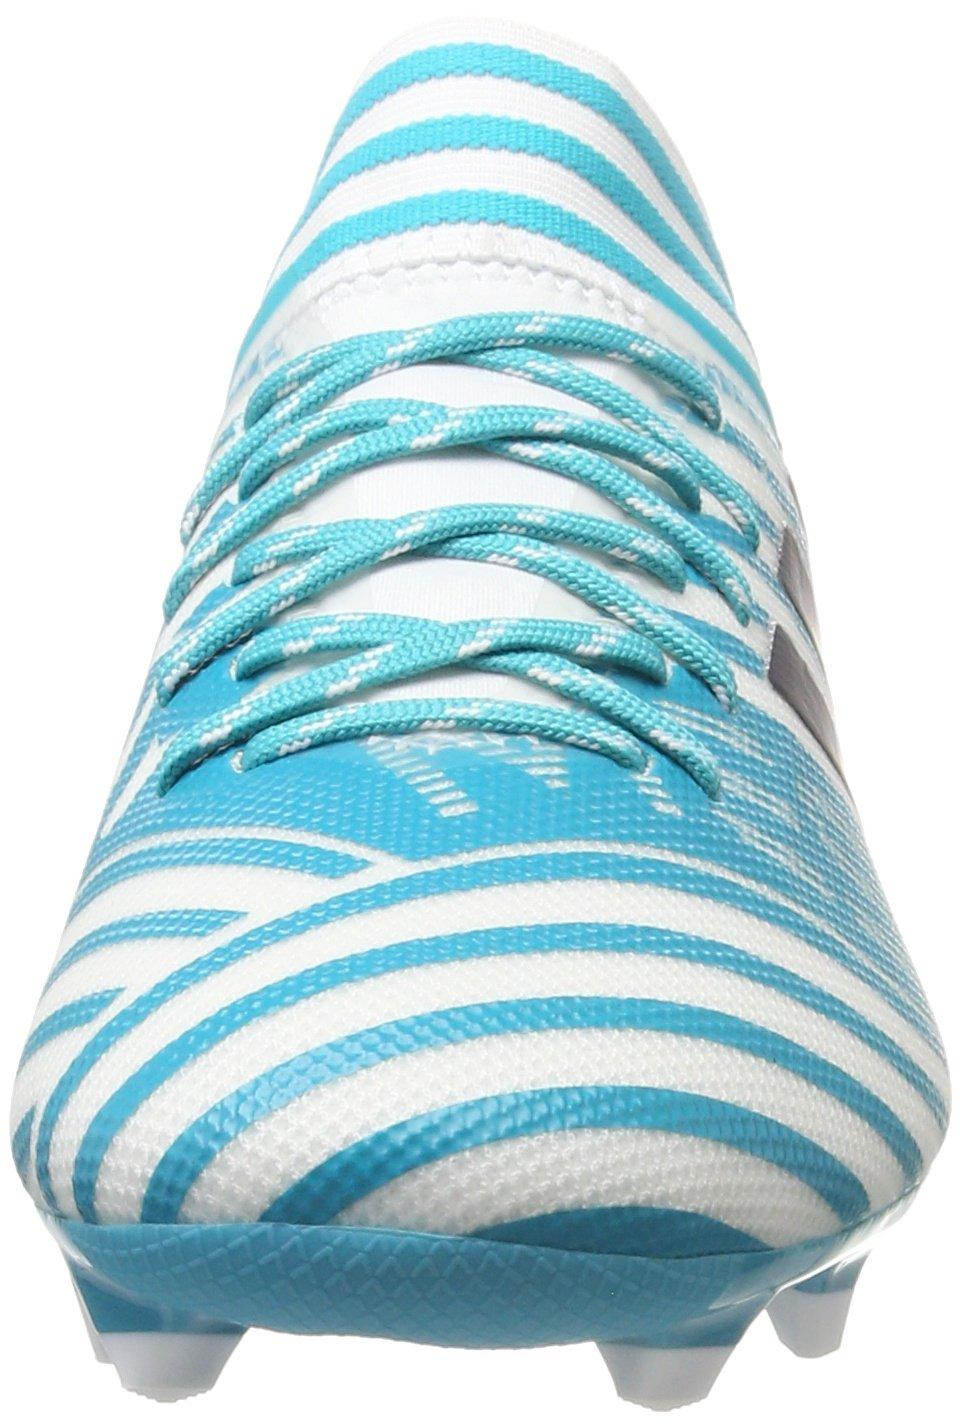 adidas Chaussures Nemeziz Ink Energy Messi FG, Chaussures adidas de Football ecc30f